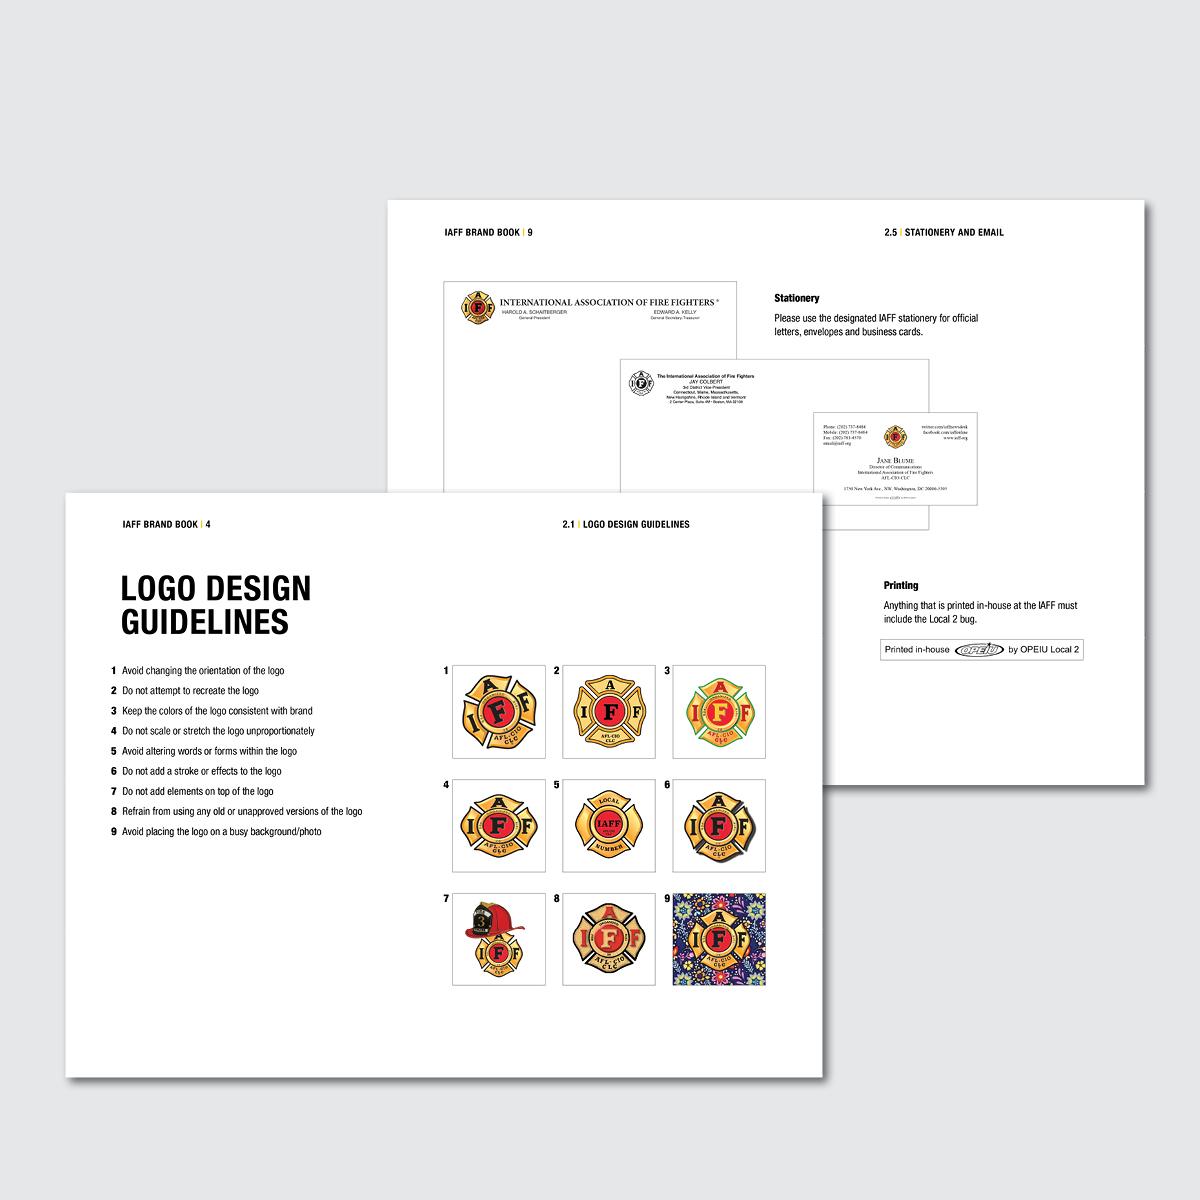 portfolio_IAFF_brandbook4.jpg